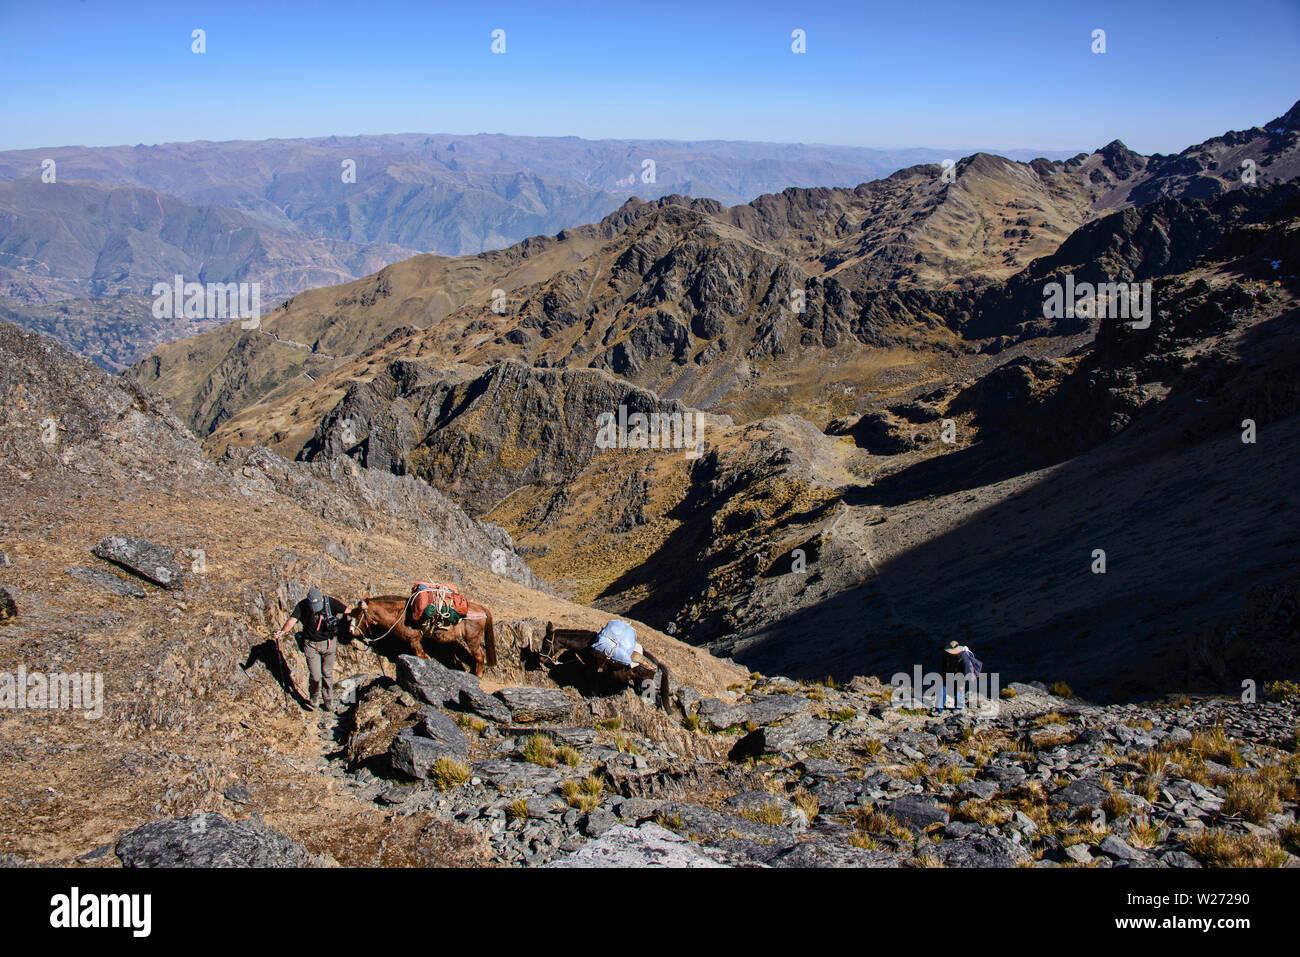 Trekking across the Cordillera Real mountain range, Bolivia Stock Photo